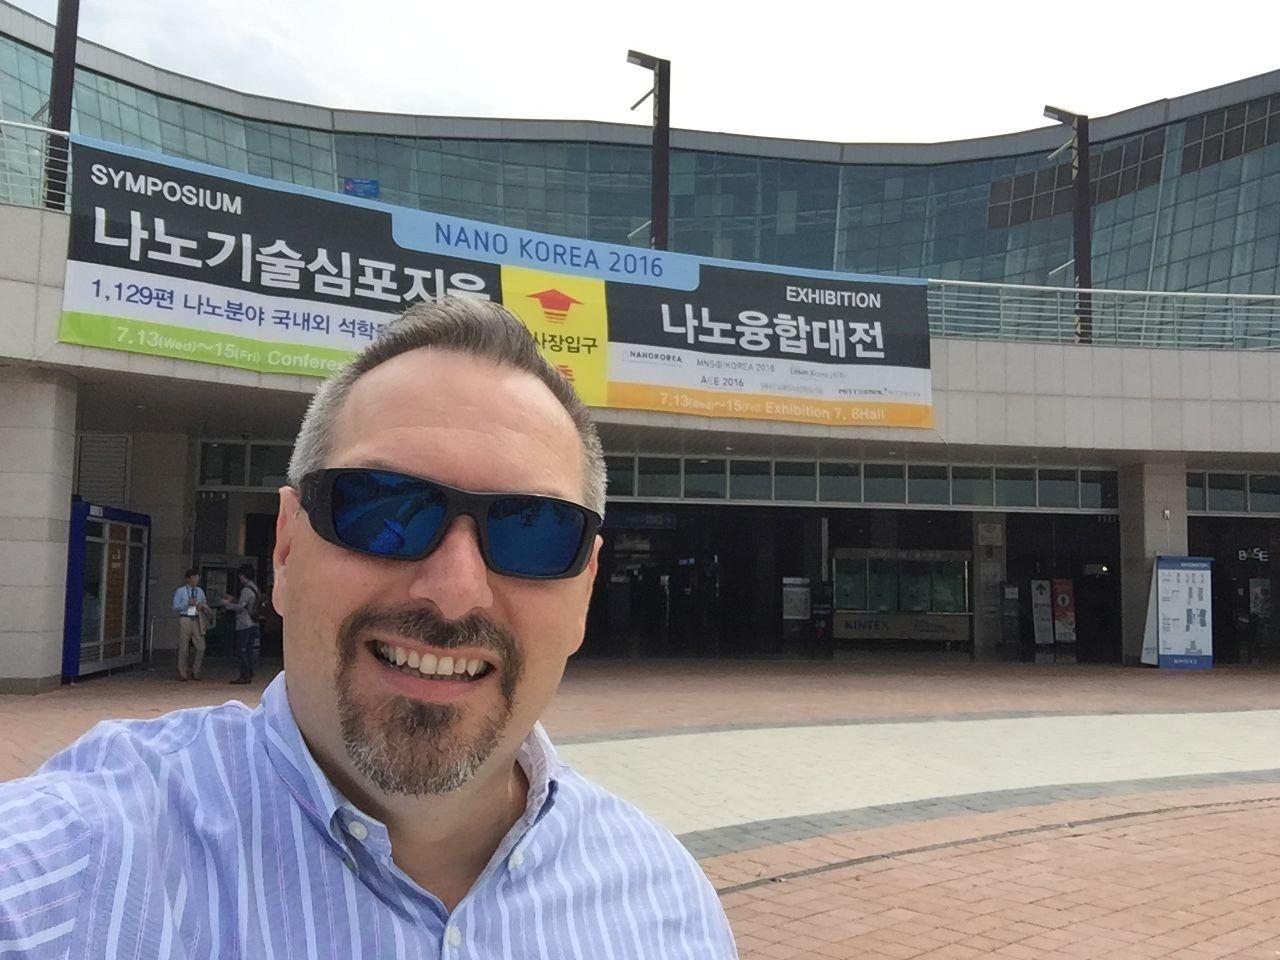 NanoWorld CEO at NanoKorea 2016